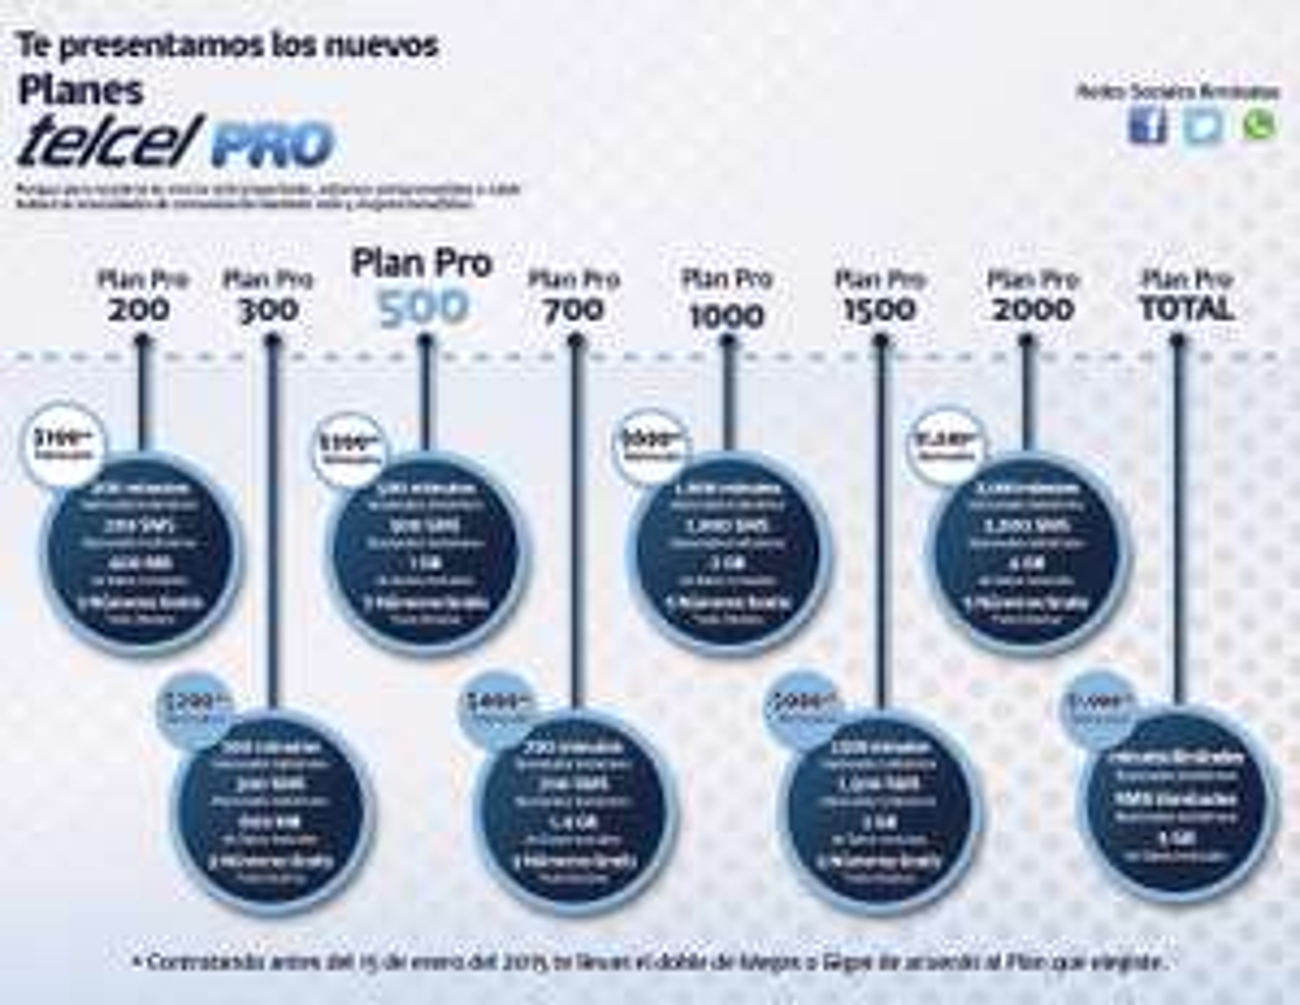 Planes Telcel Pro: doble de megas de por vida extendido